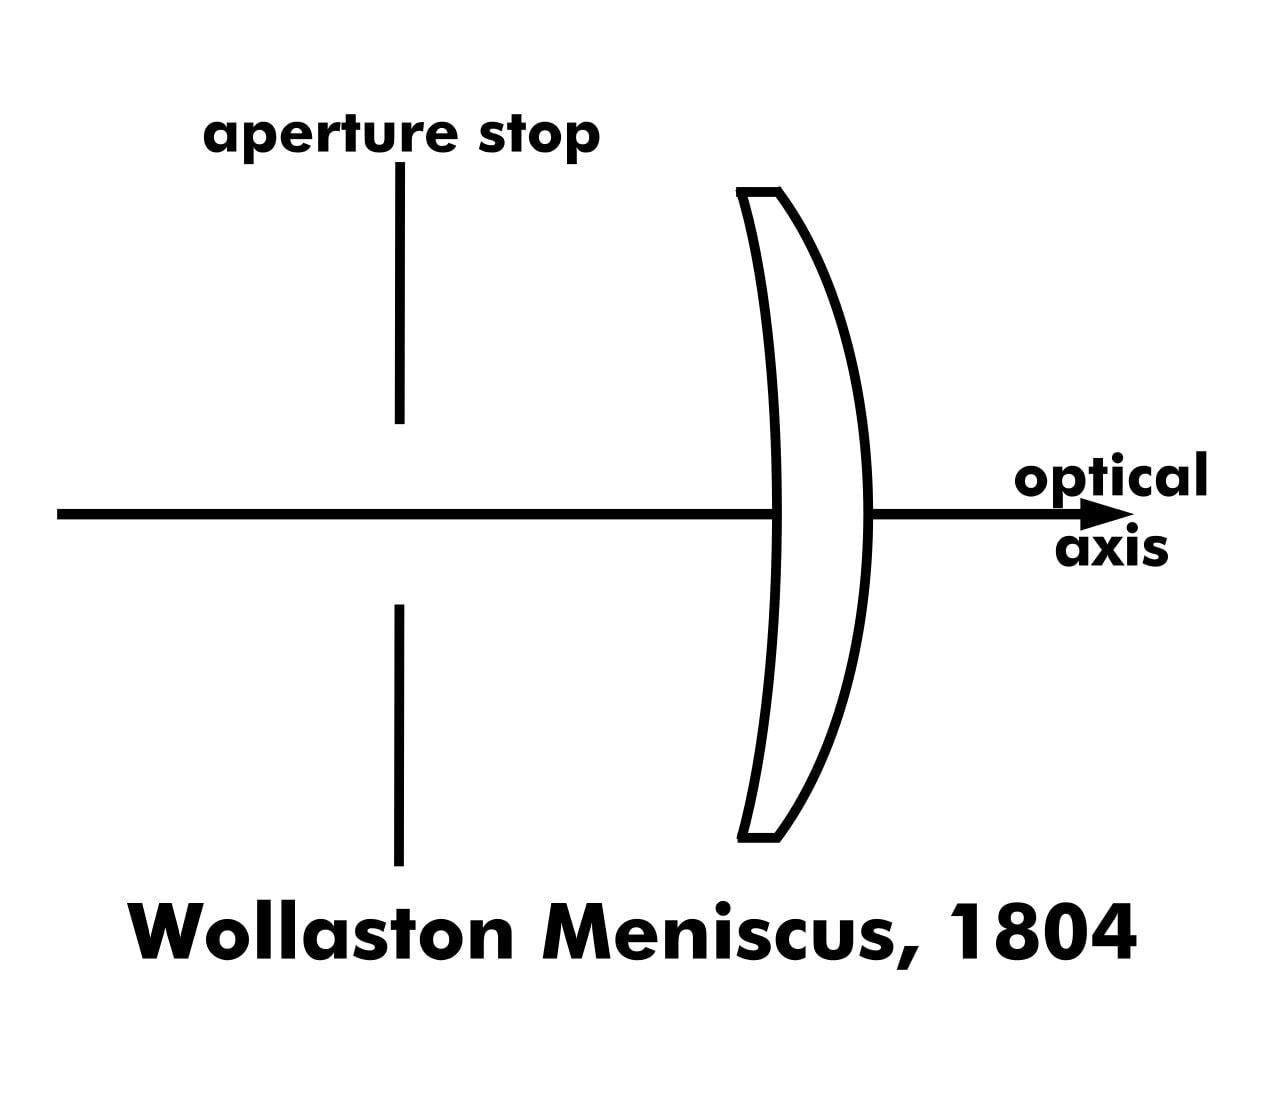 Wollaston Meniscus Lens, 1804.